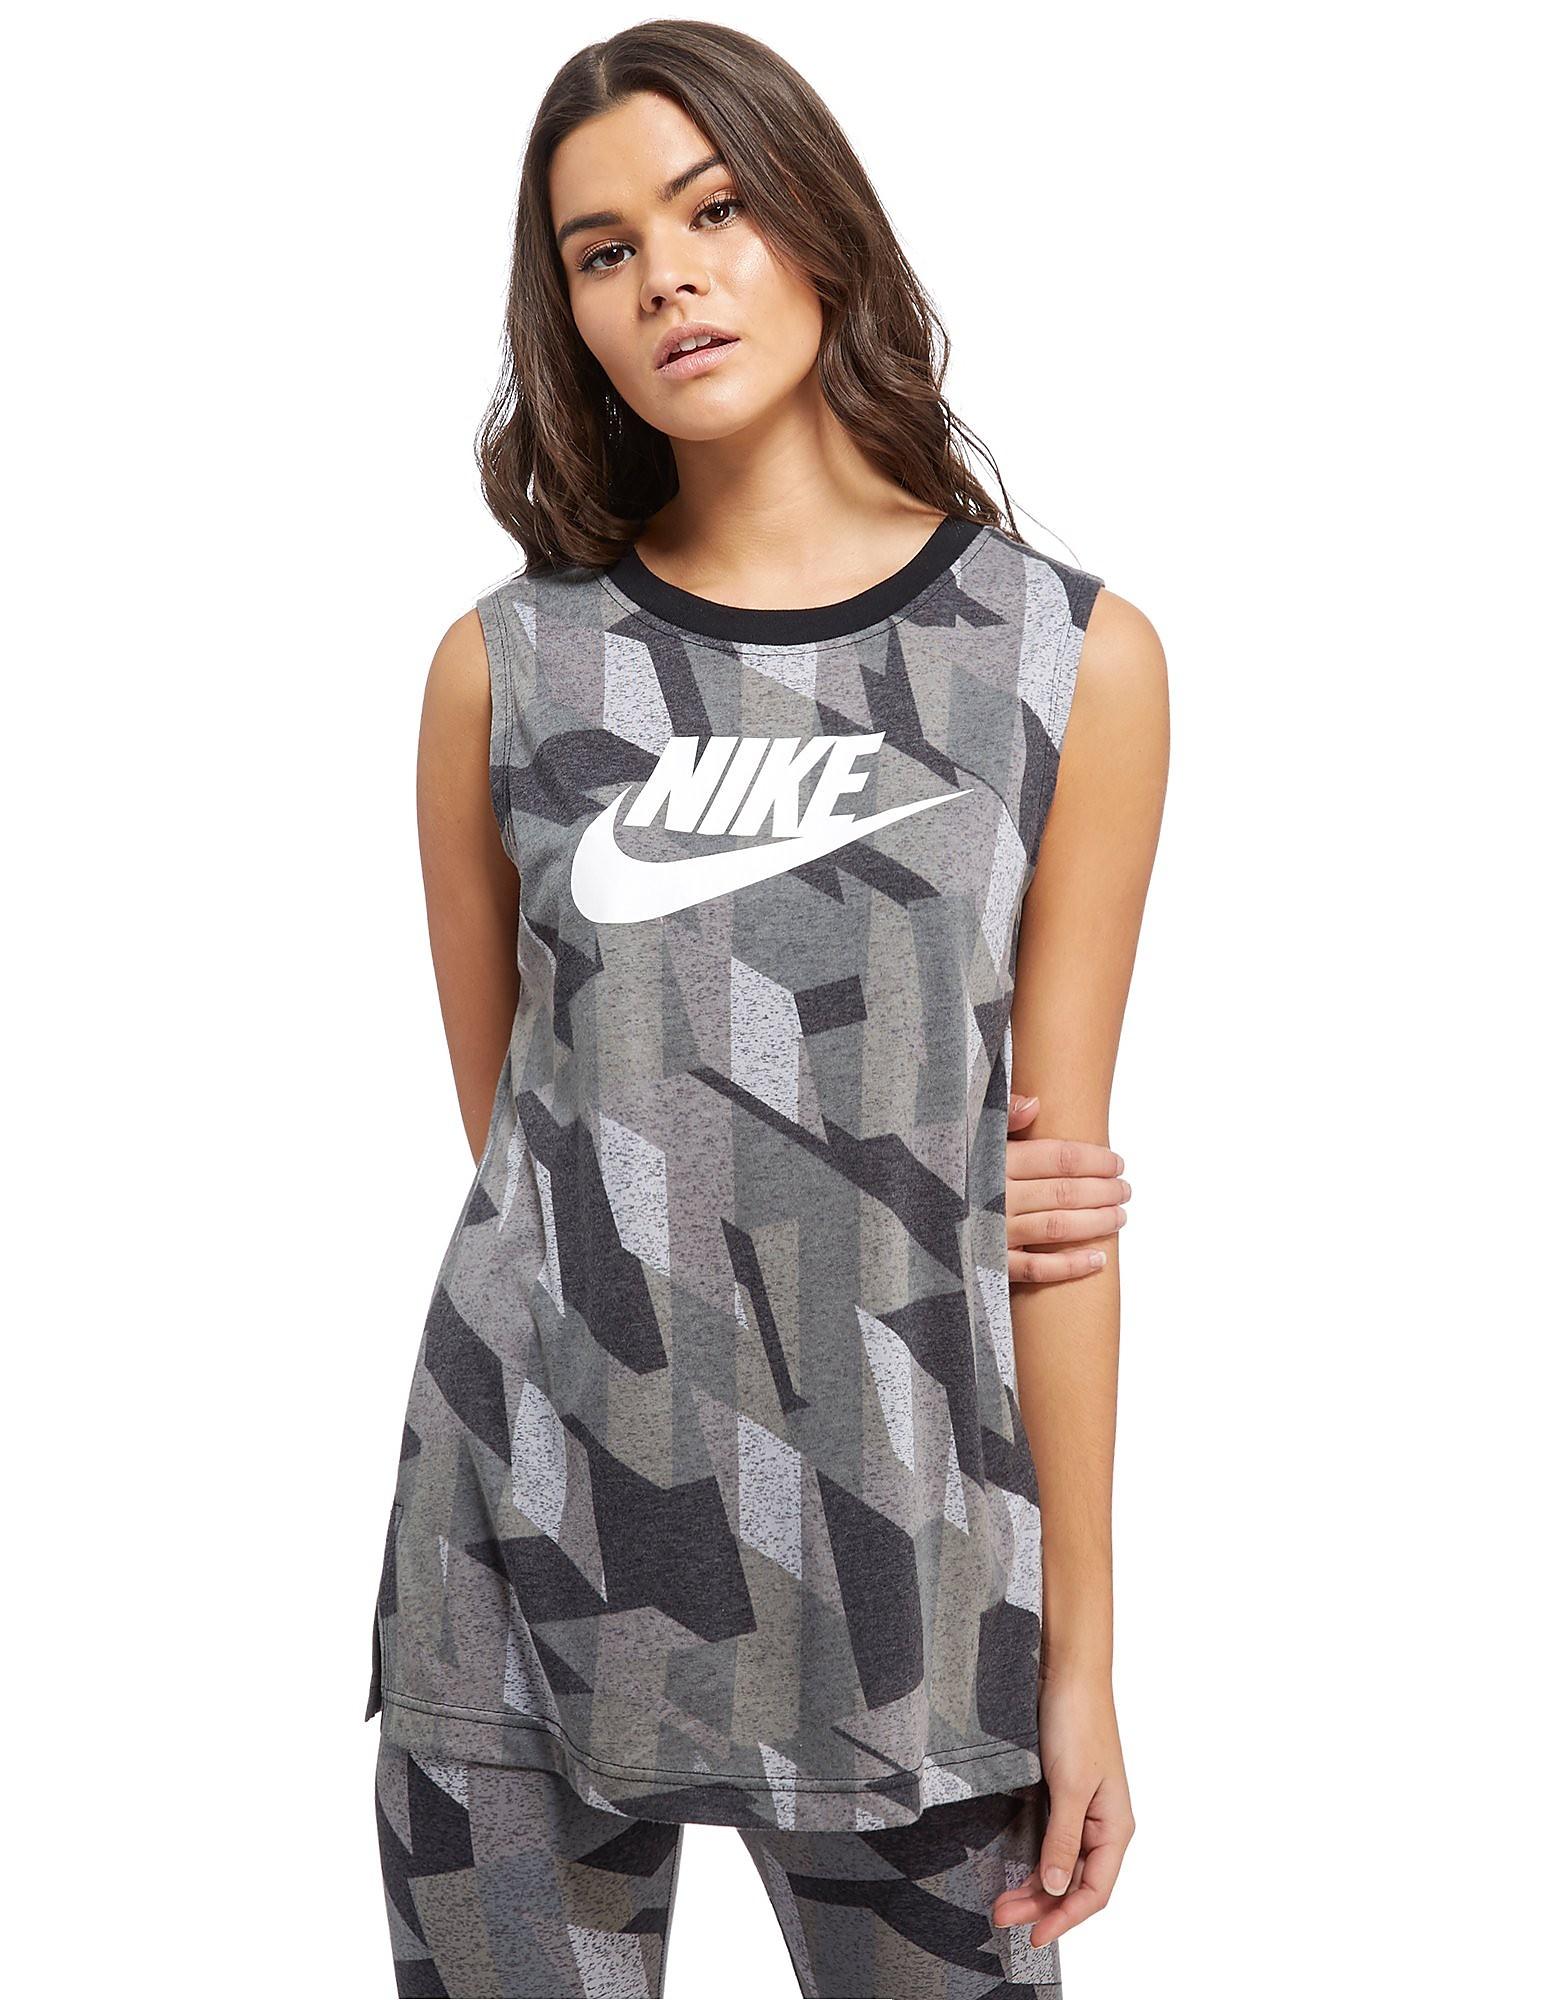 Nike Sky All-Over-Print Tank